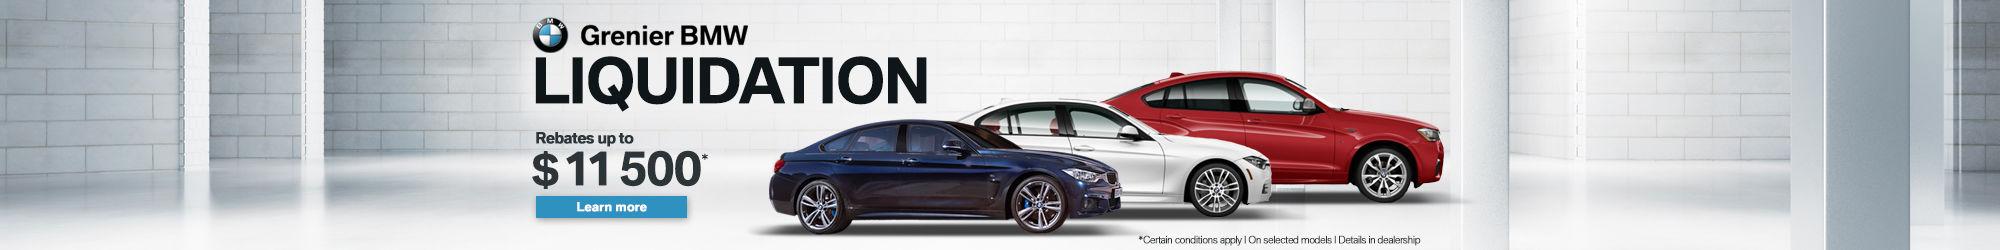 New vehicle liquidation